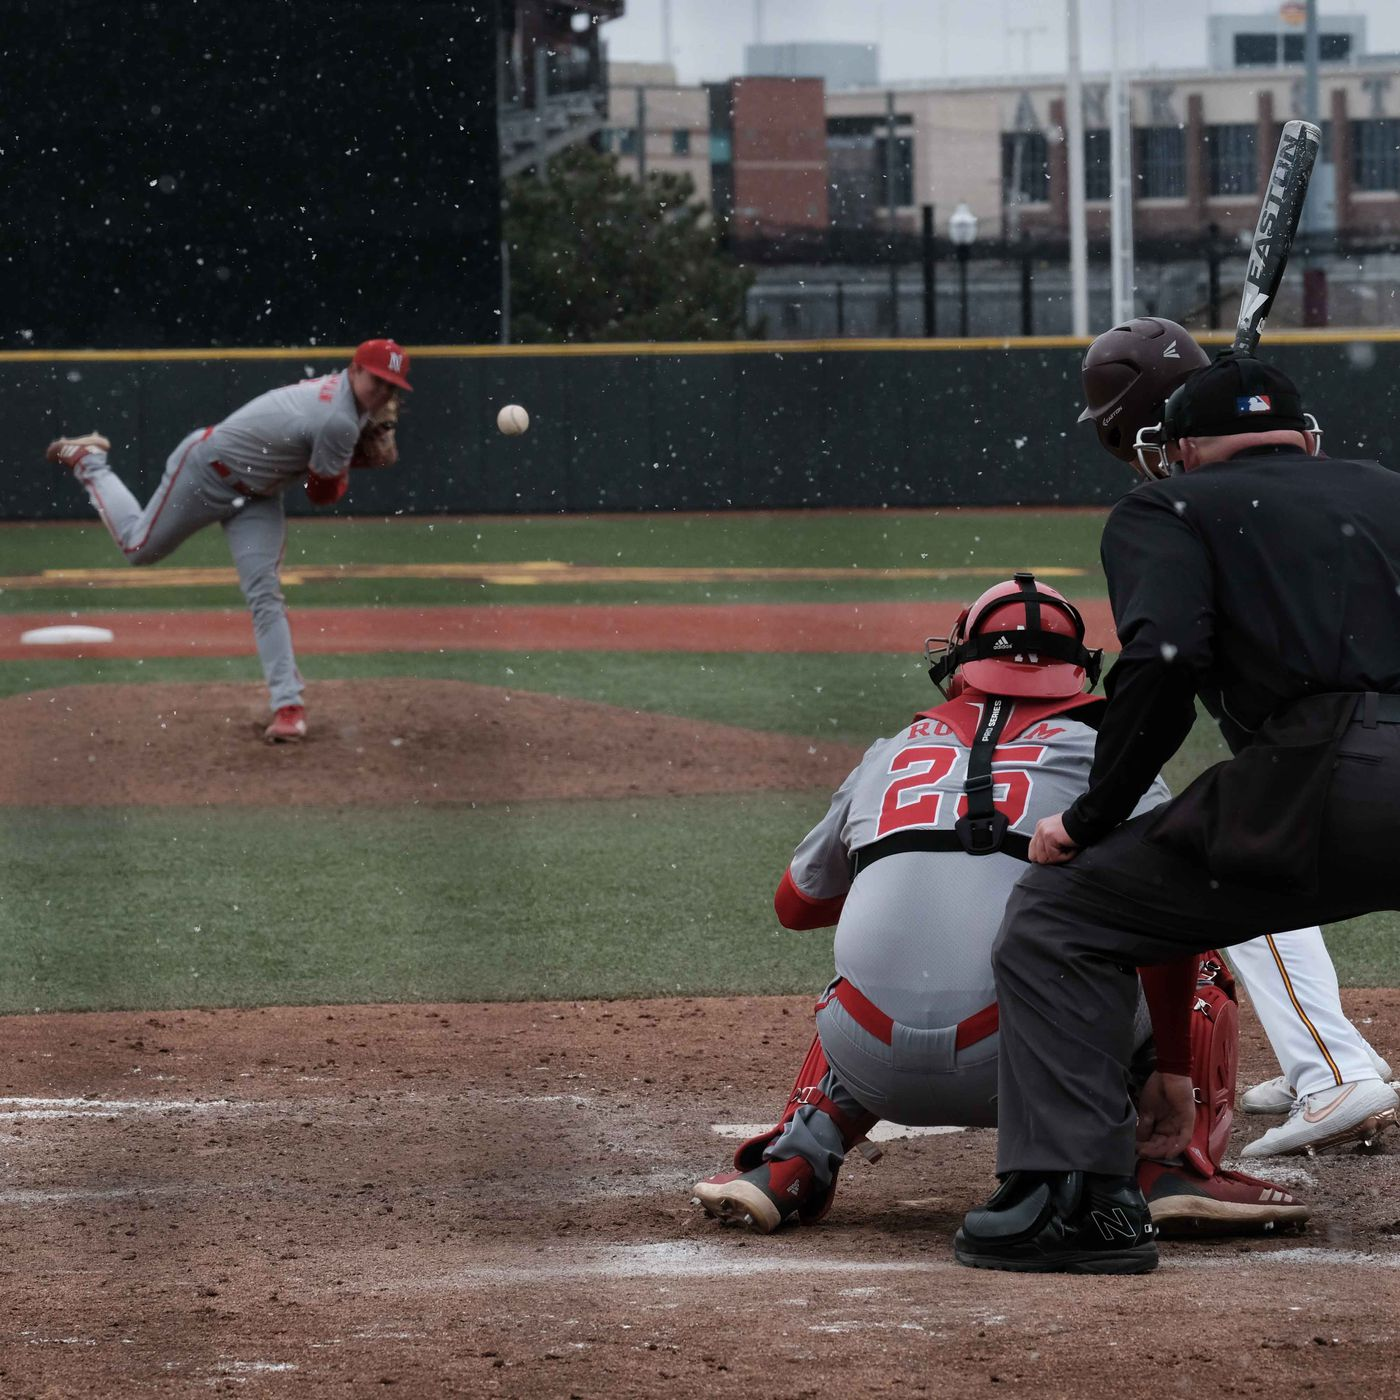 nebraska vs michigan baseball